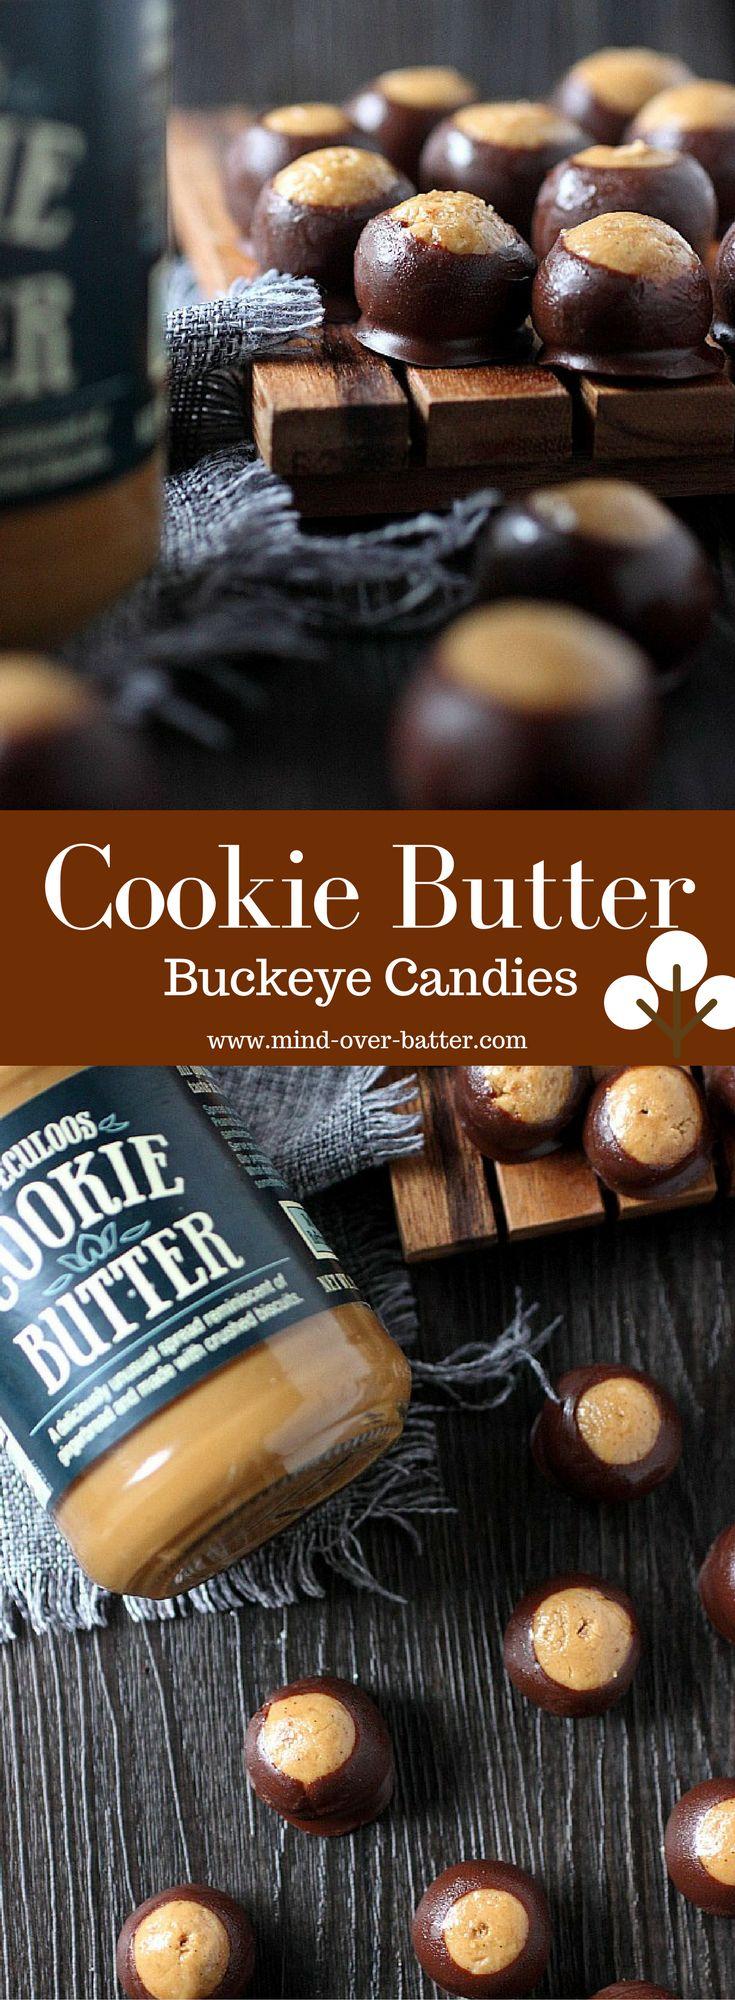 Cookie Butter Buckeye Candies www-mind-over-batter.com